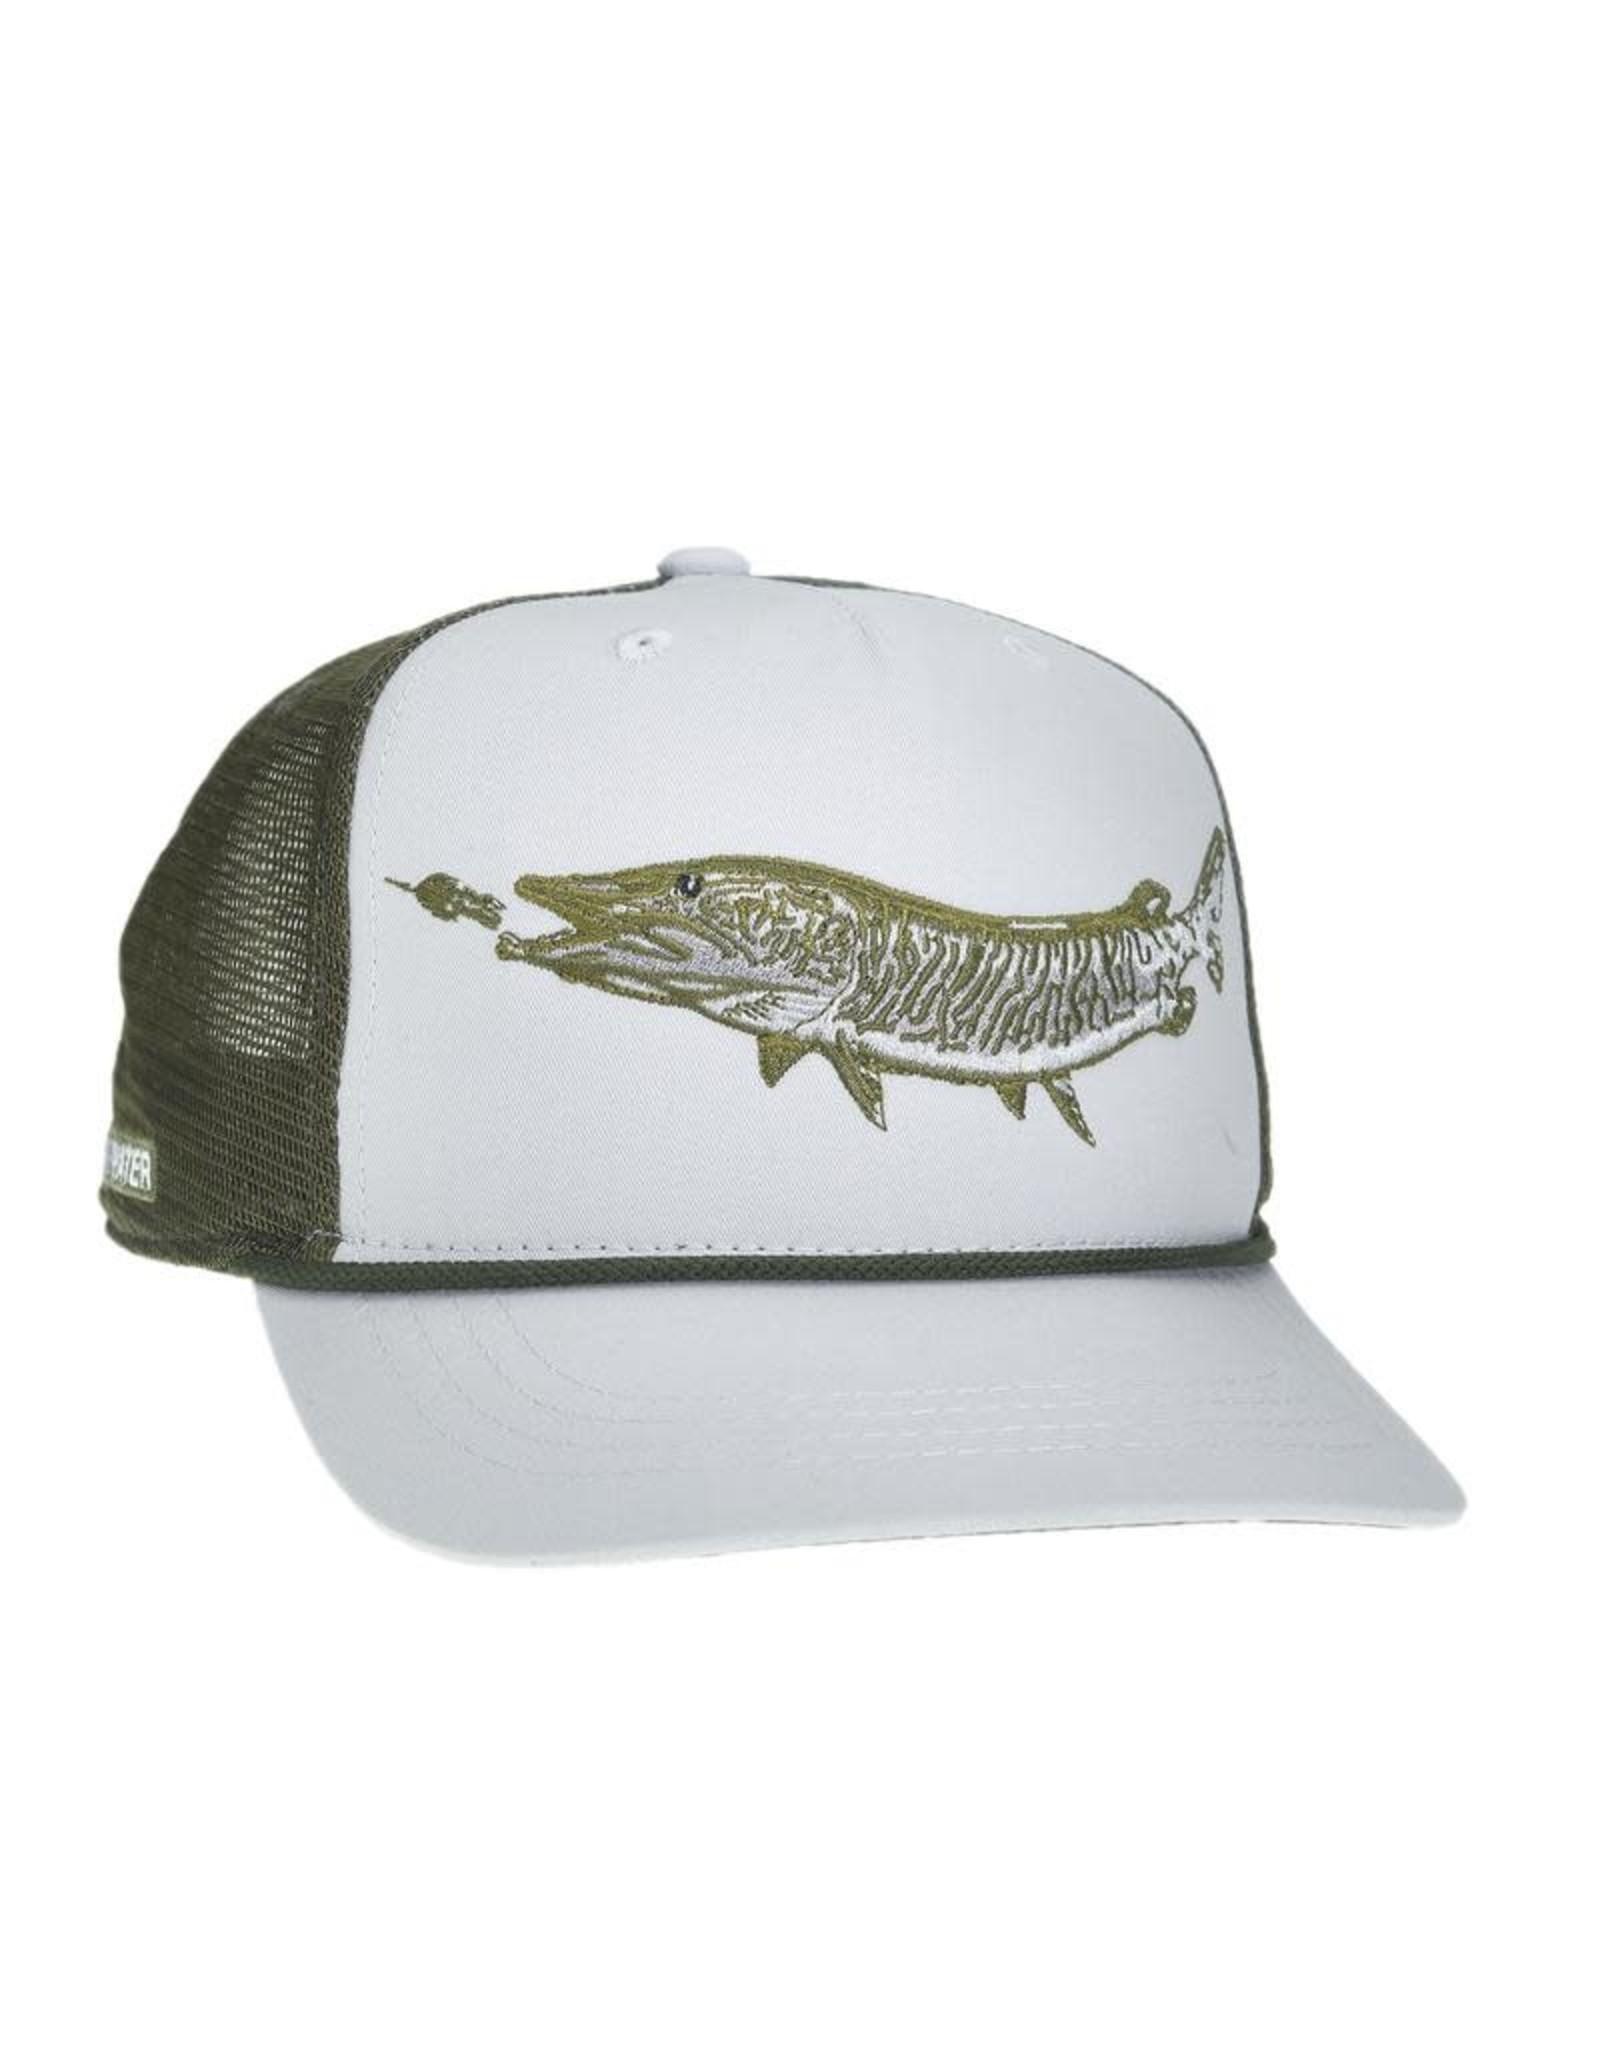 Rep Your Water RepYourWater Artist's Reserve Musky Hat